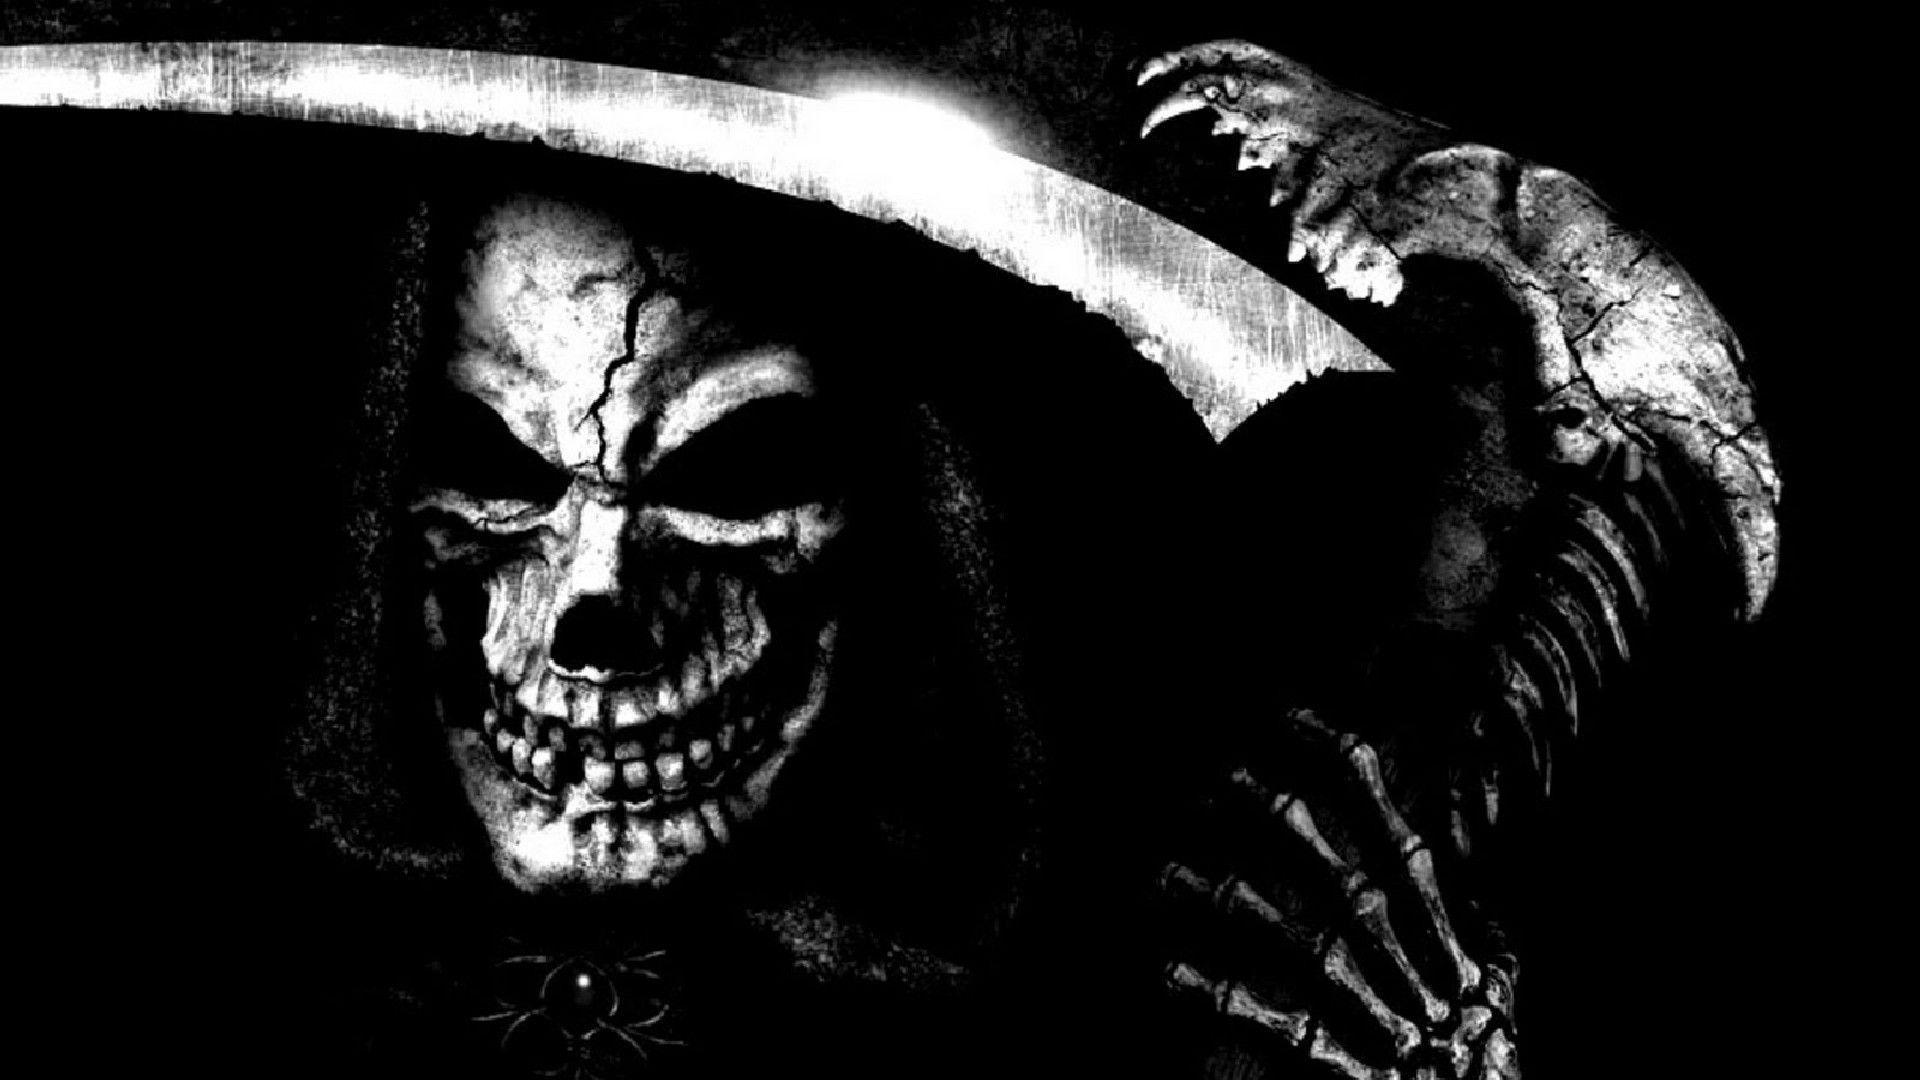 Grim Reaper HD Wallpapers Backgrounds Wallpaper